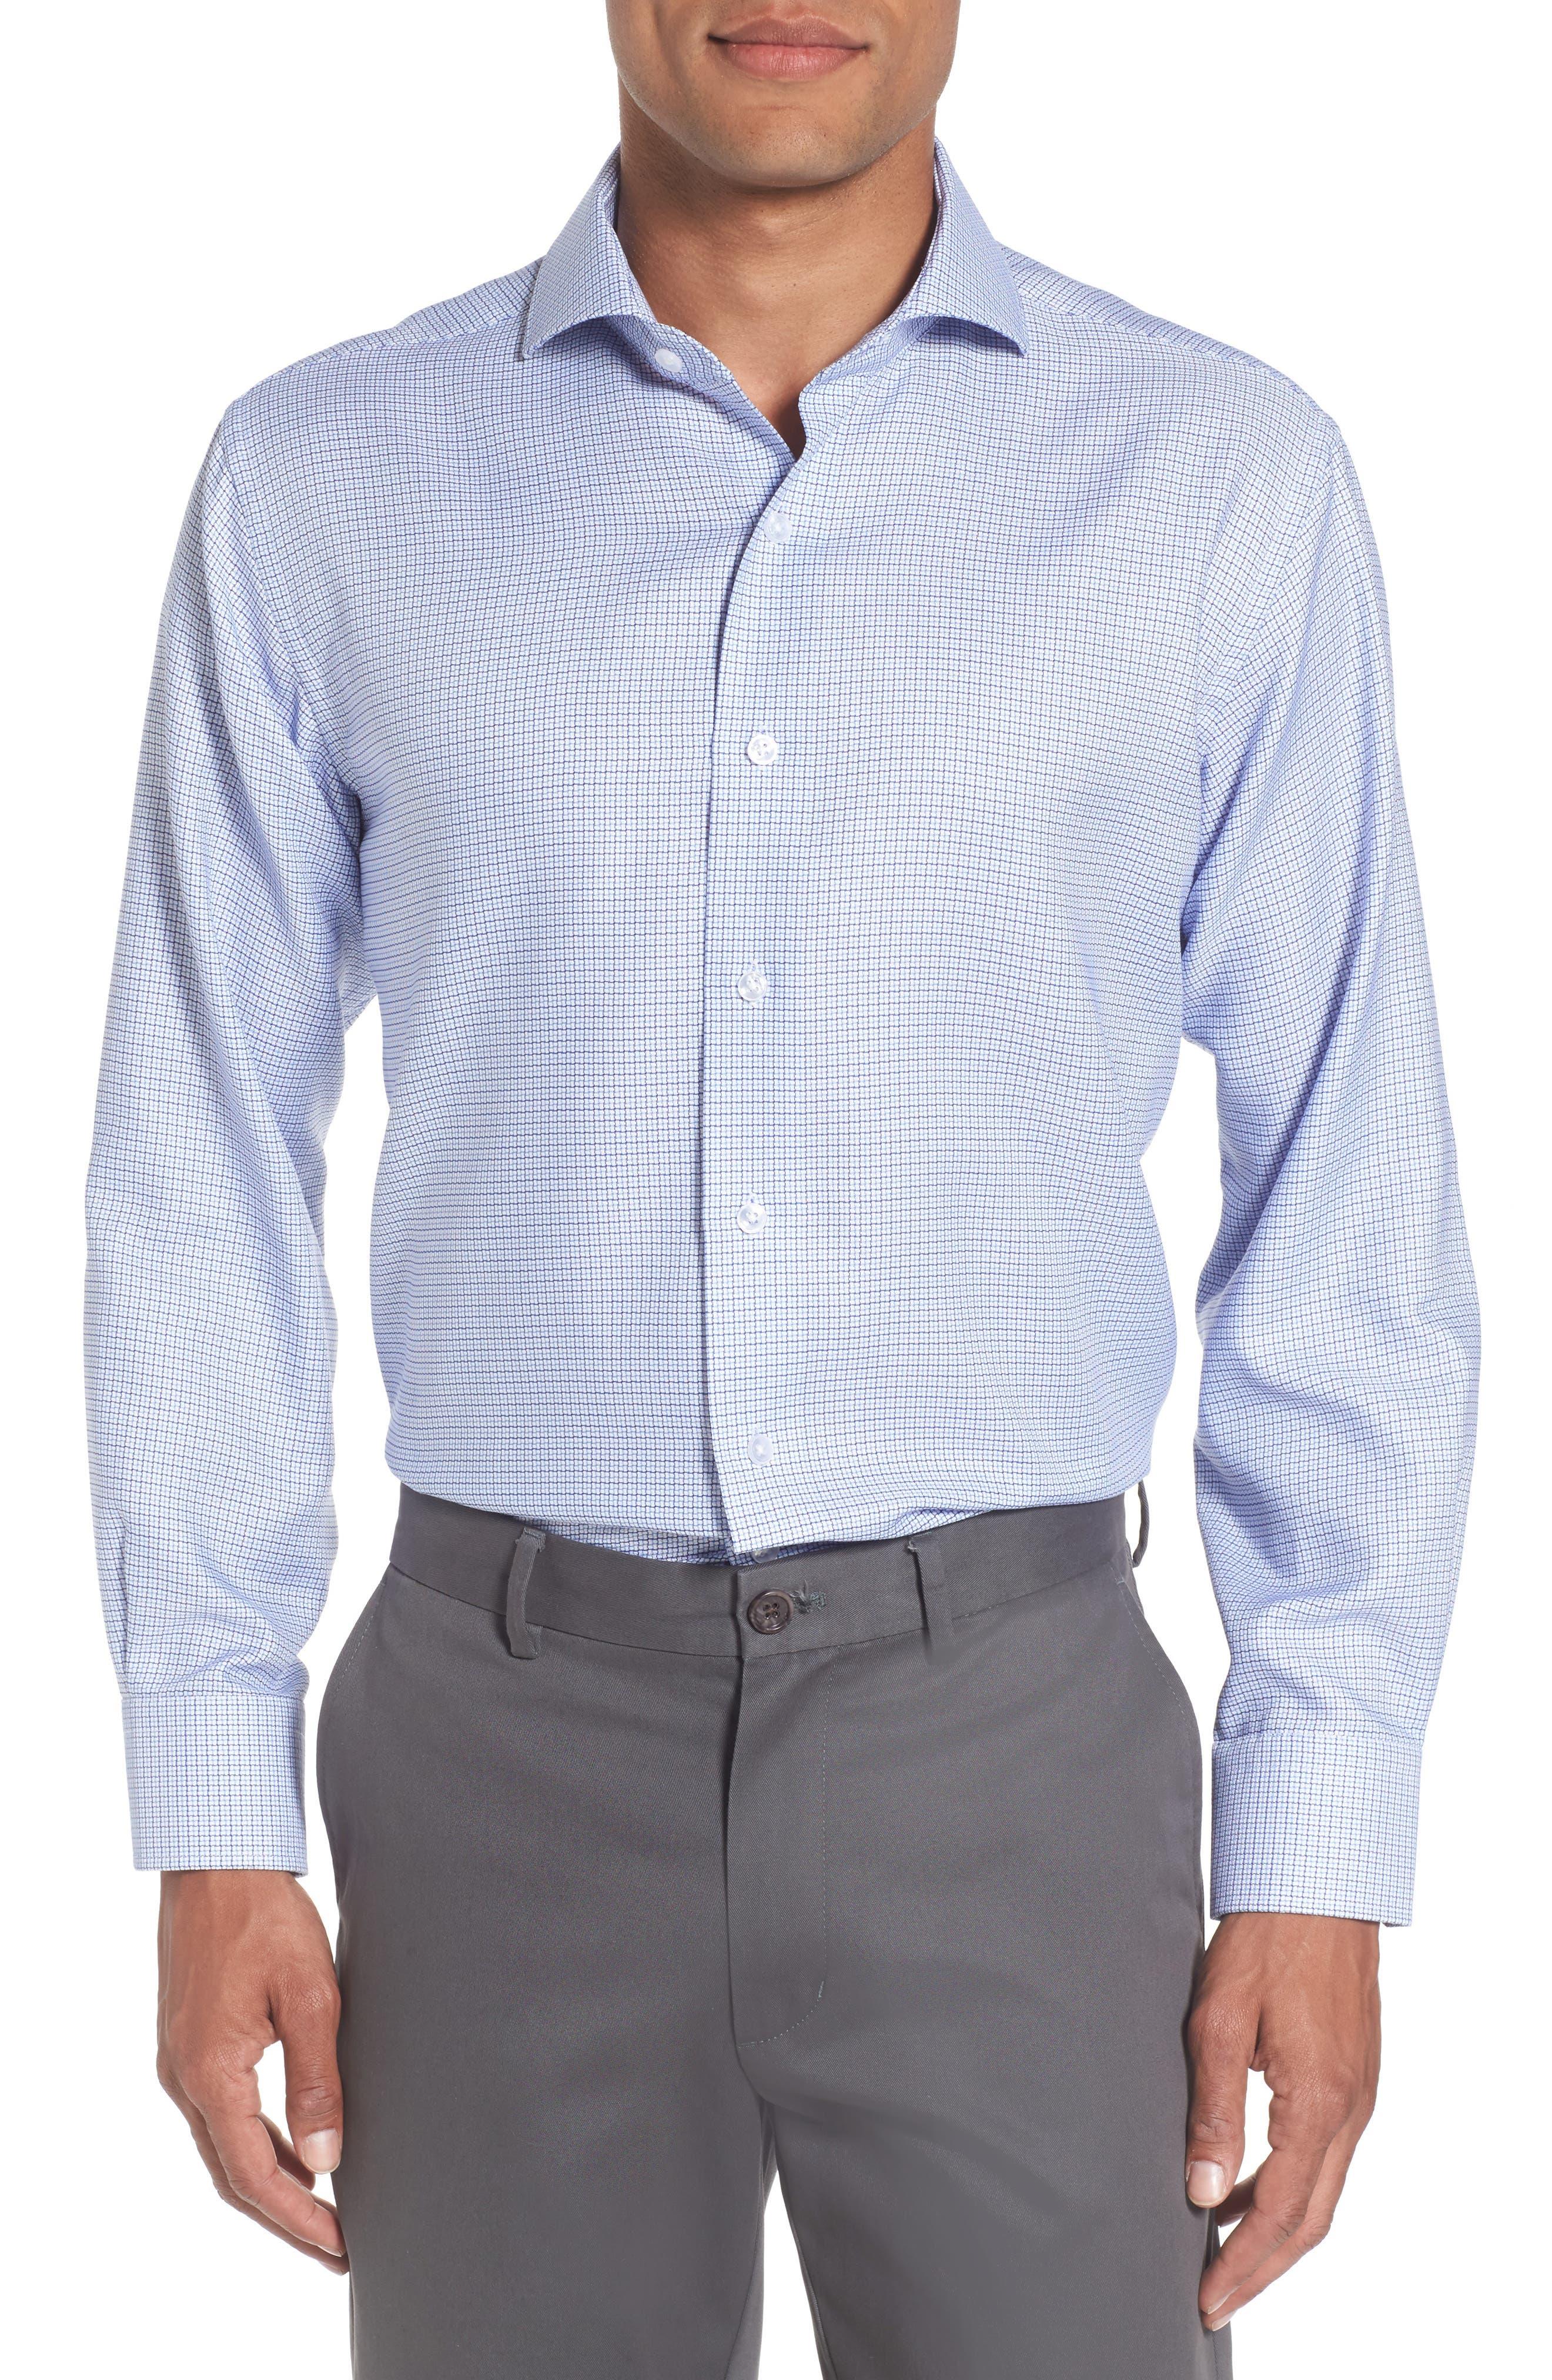 Trim Fit Check Dress Shirt,                             Main thumbnail 1, color,                             Light Blue/ Navy